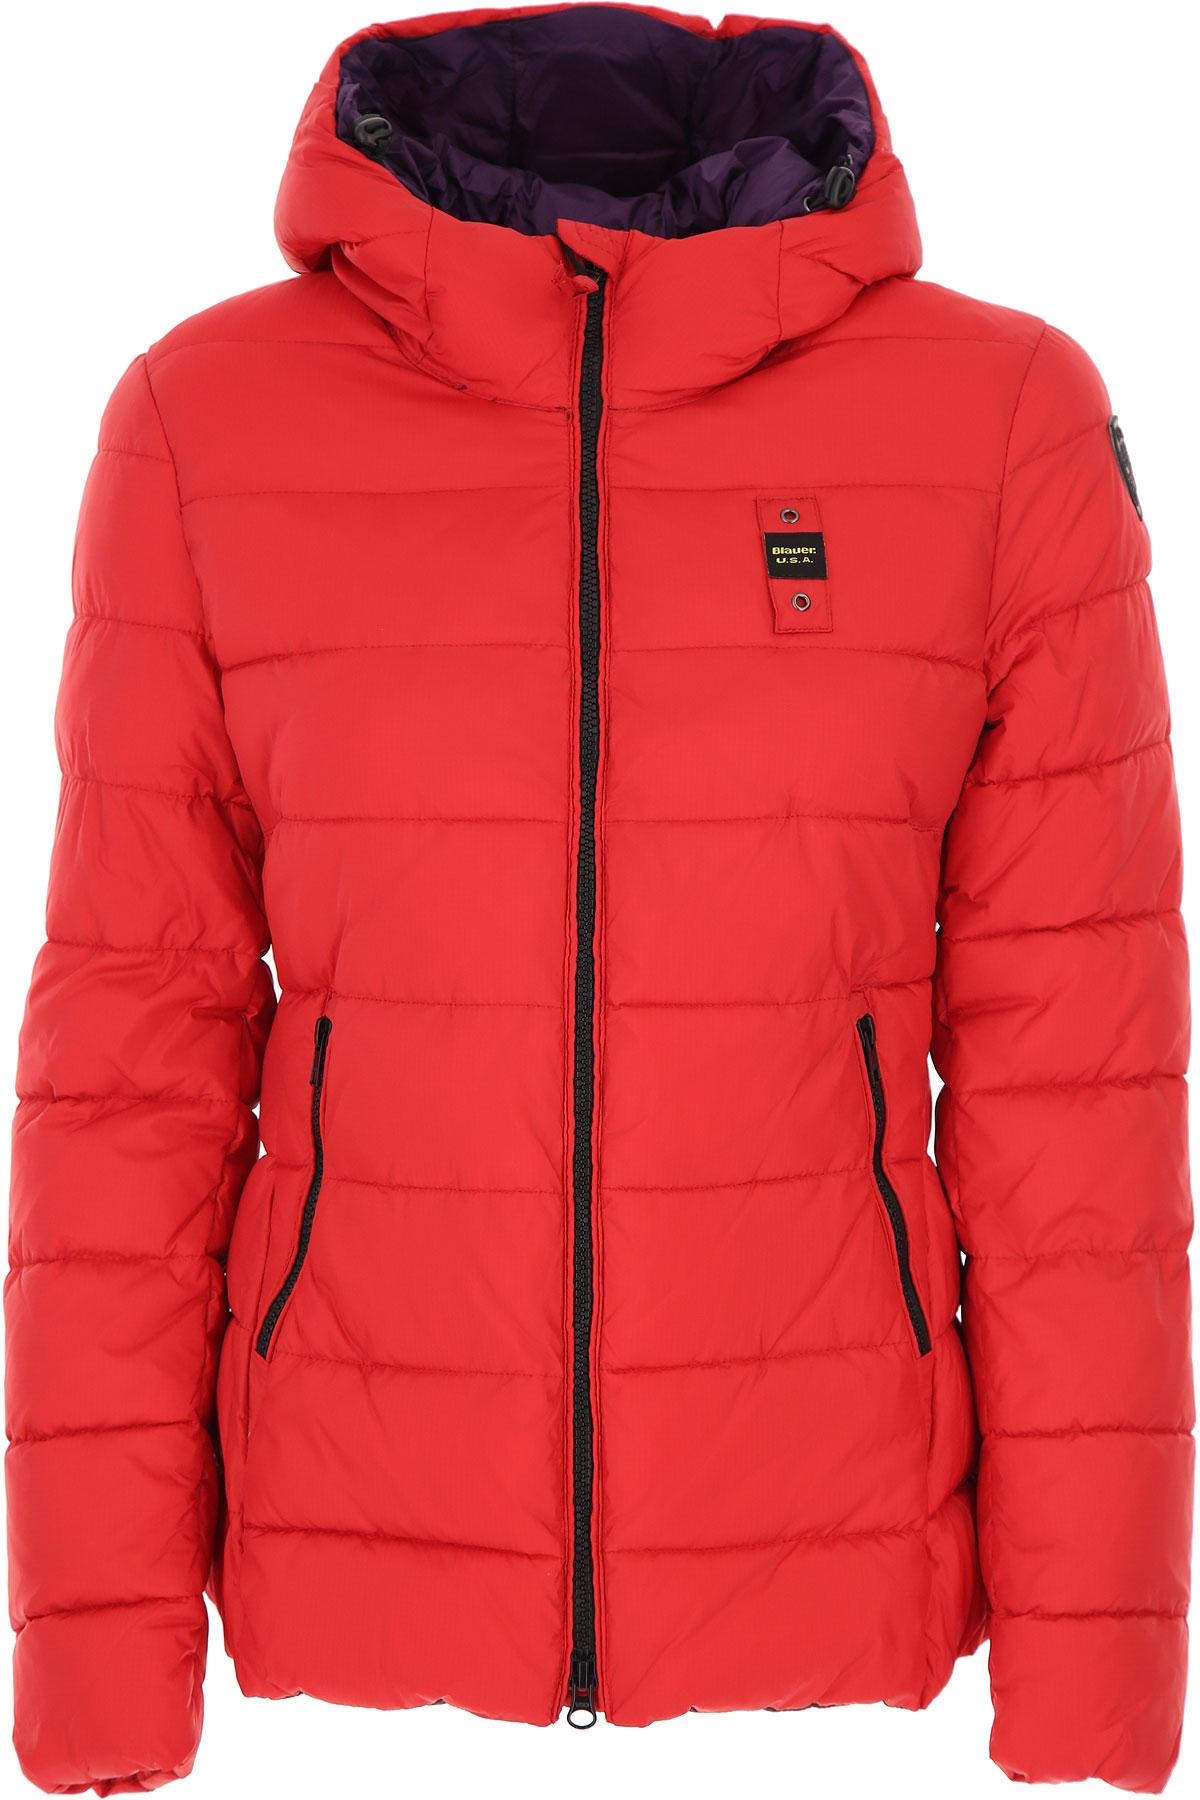 Blauer Down Jacket for Women, Puffer Ski Jacket On Sale, Strawberry, polyester, 2019, 10 2 4 6 8